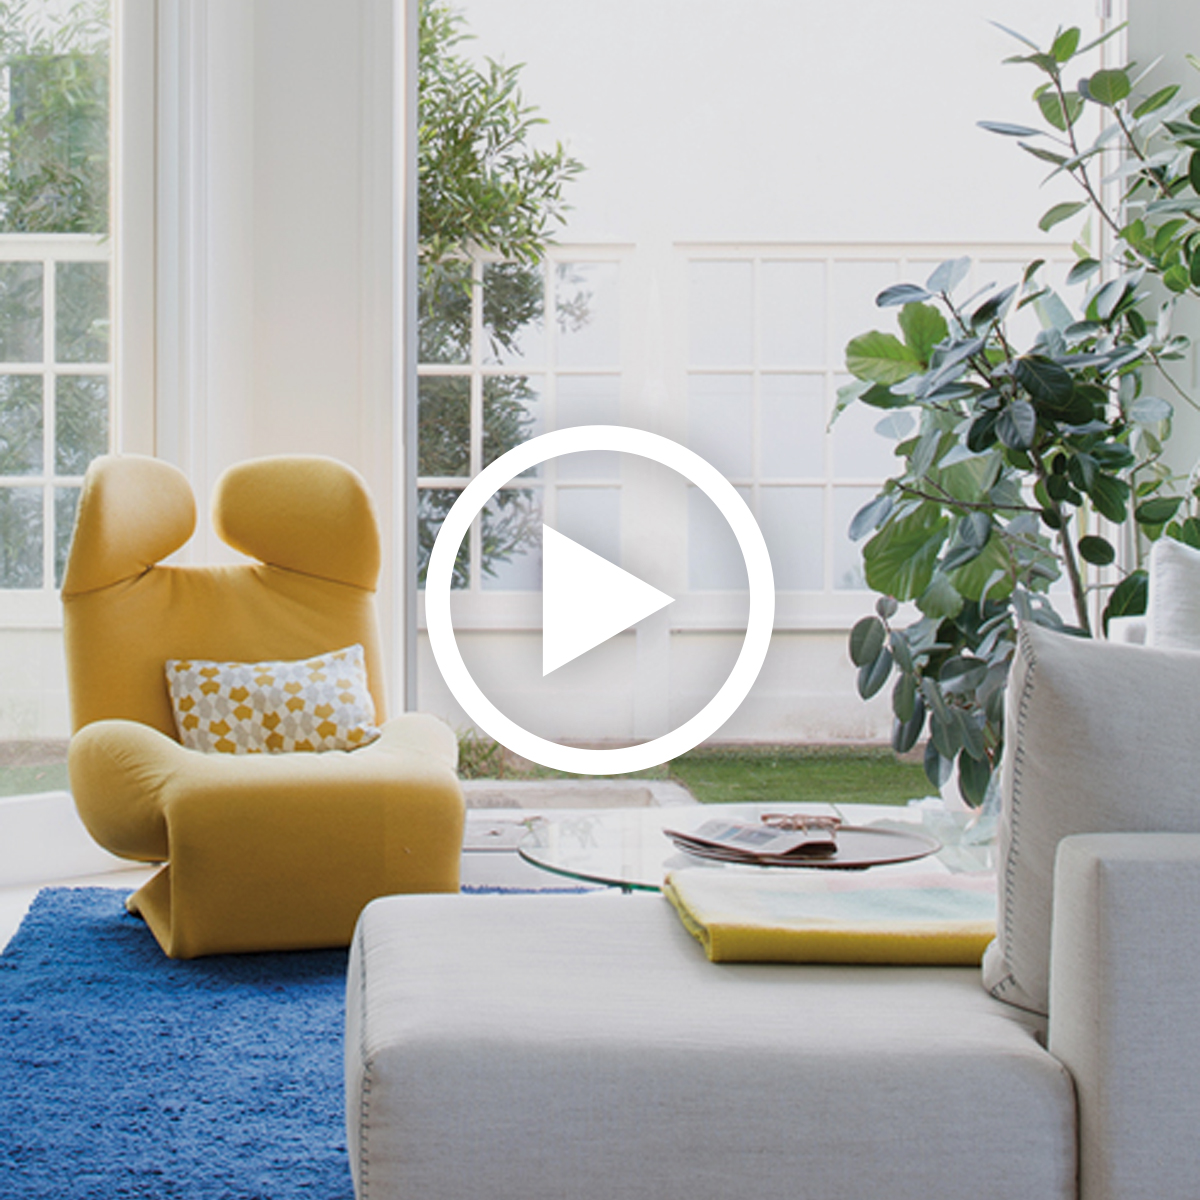 Luxe Design Tour With Regan Baker